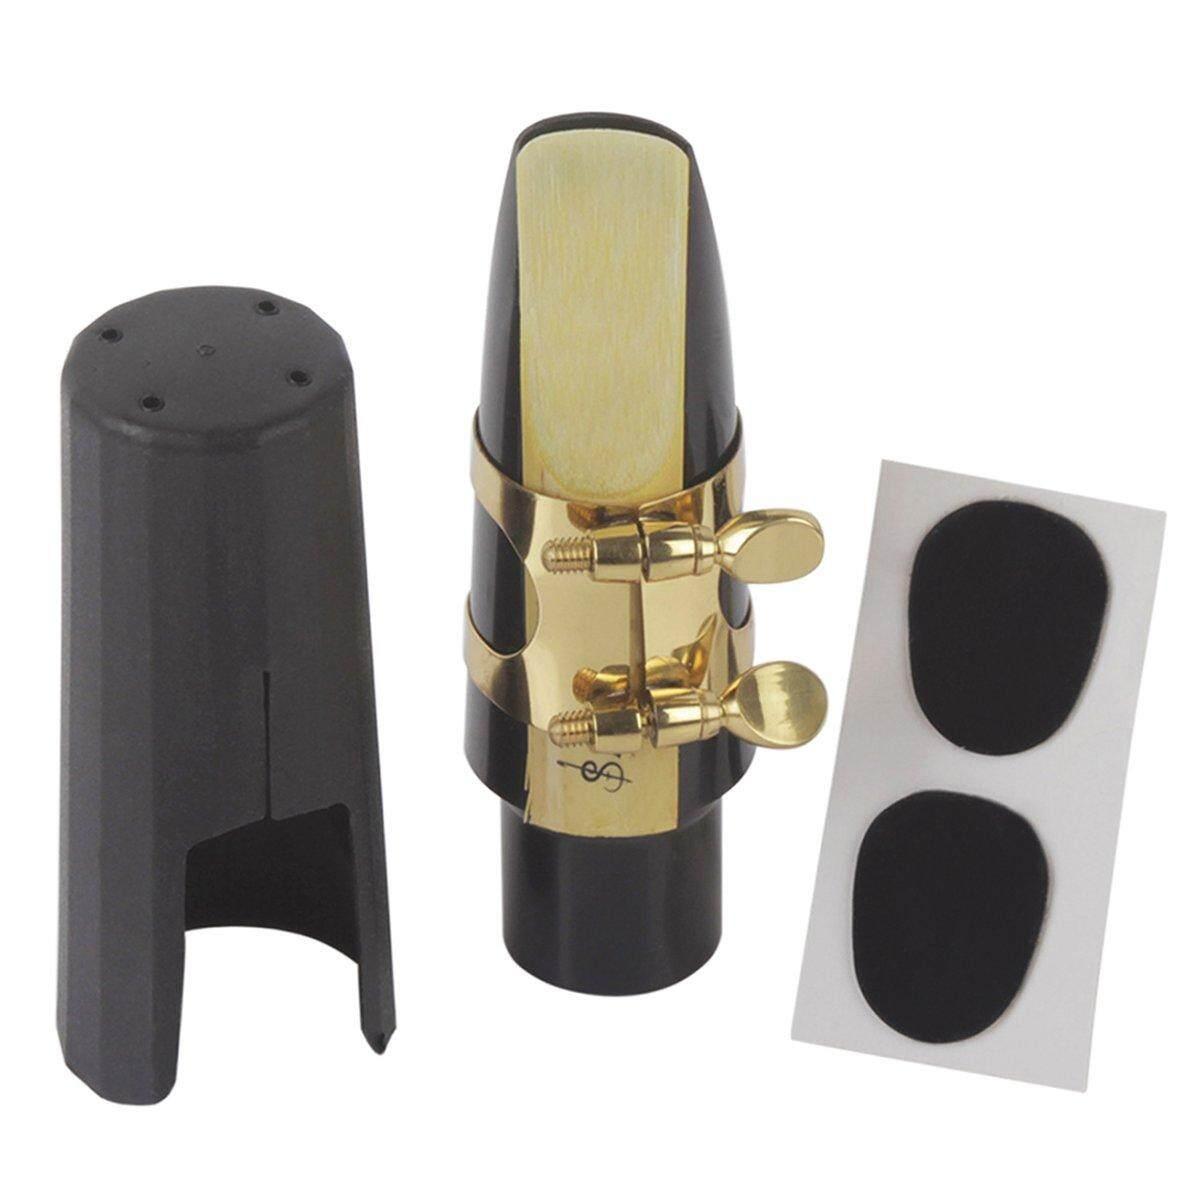 5pcs Tenor Saxophone Mouthpiece Set Musical Instrument Replacement Tool